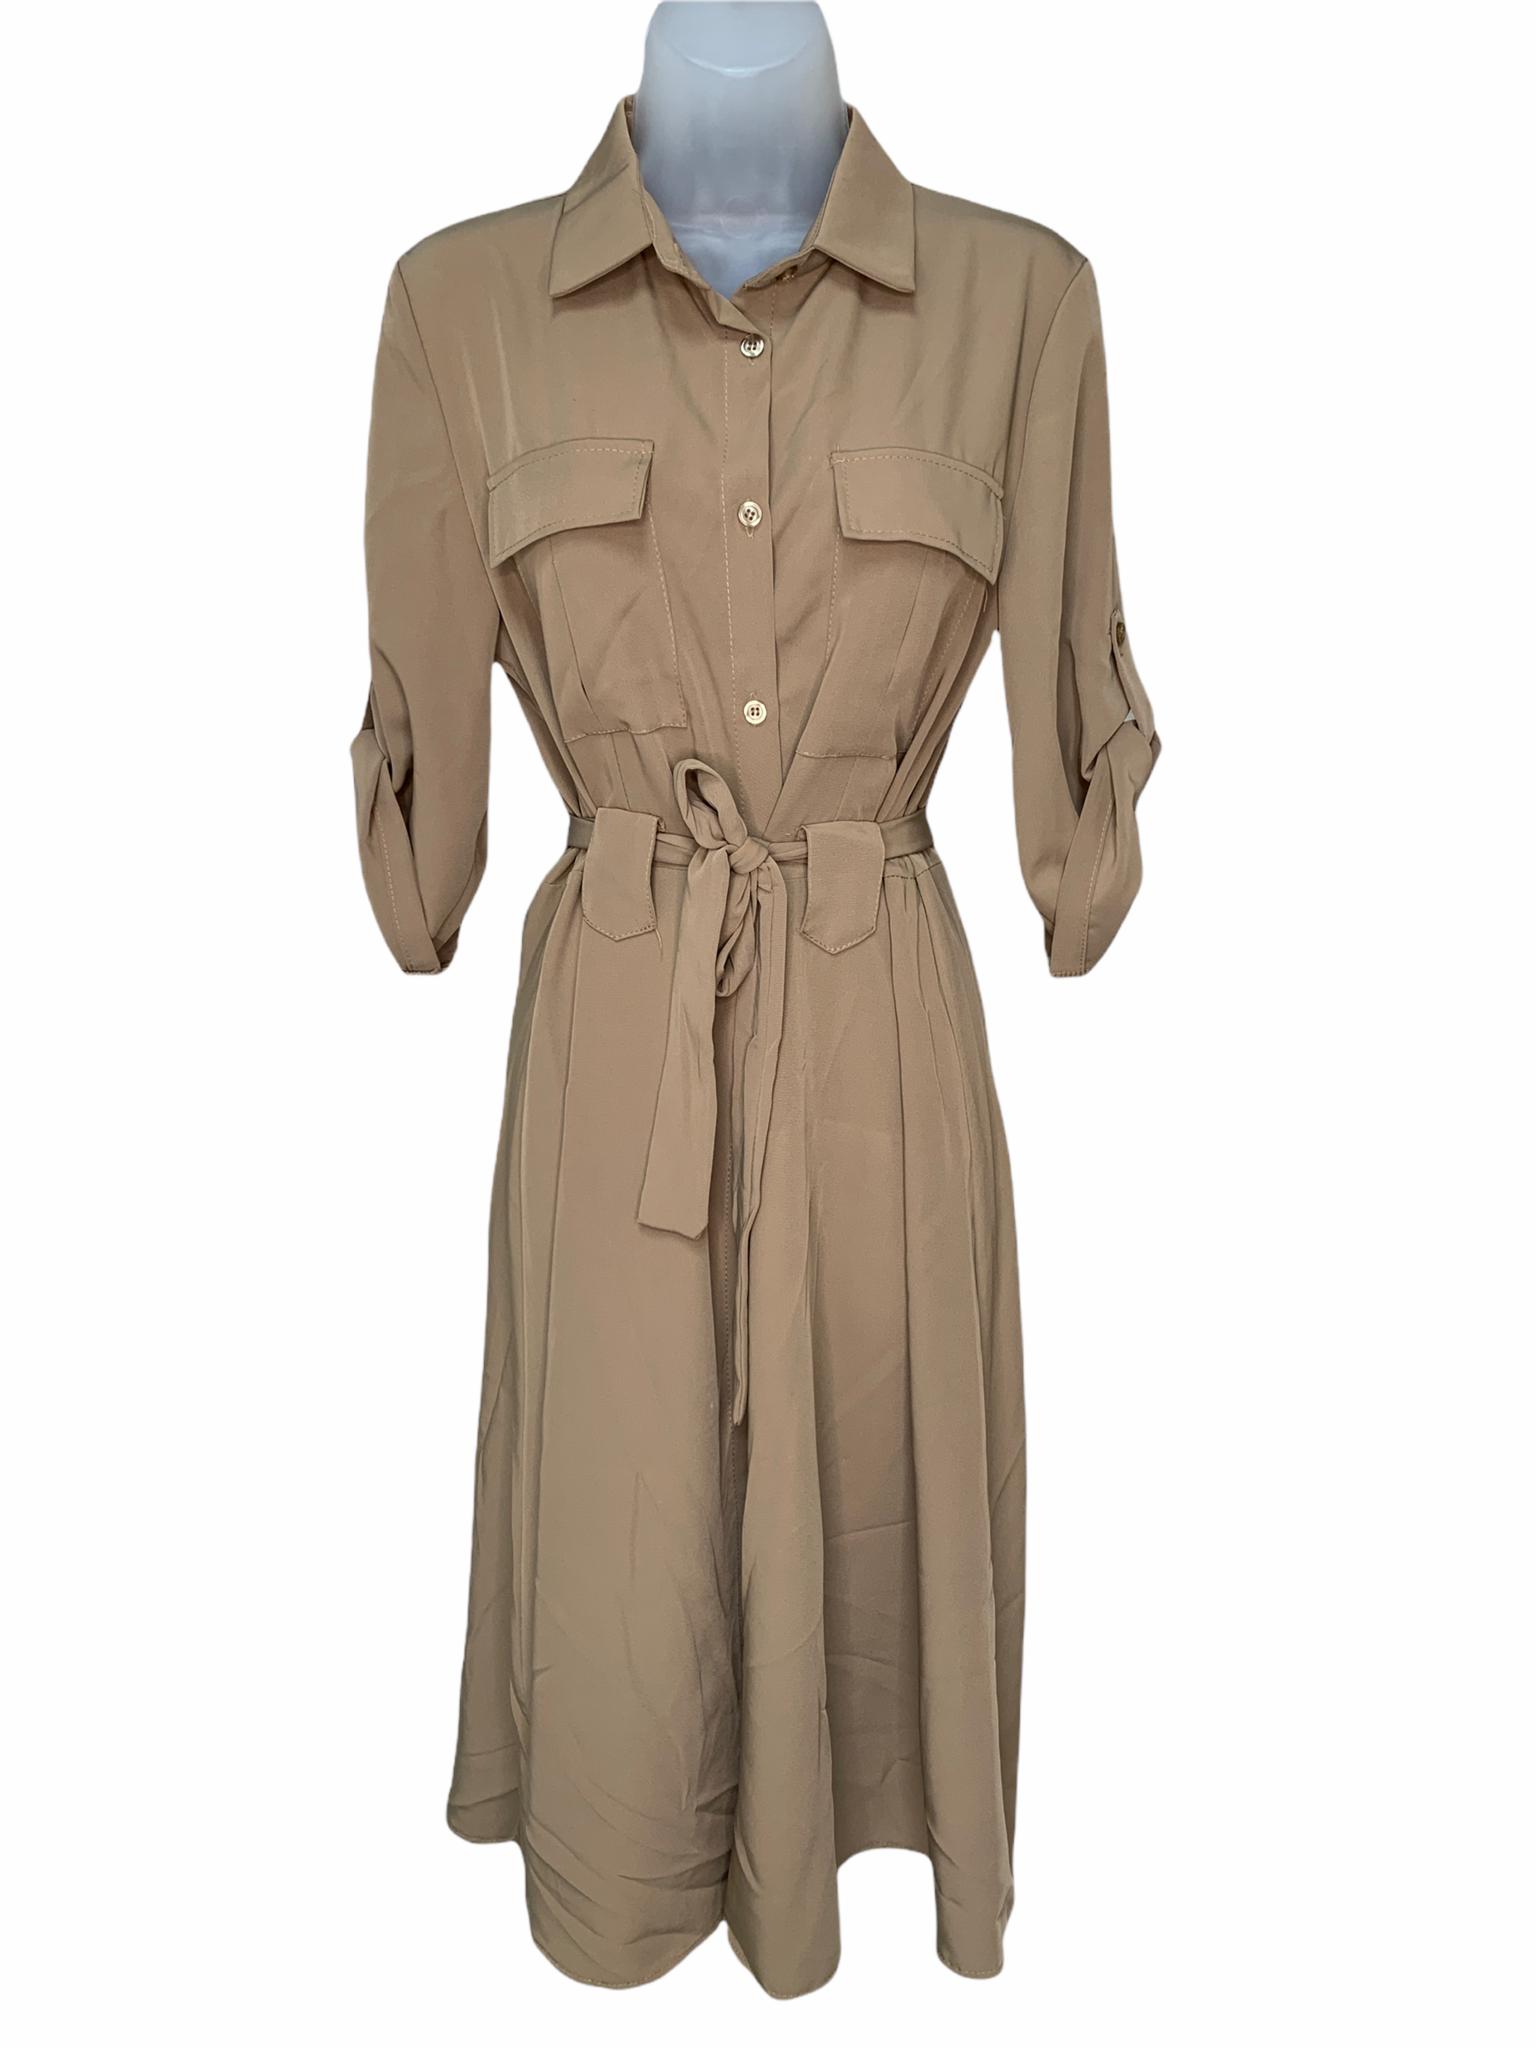 Collared Shirt Dress - Sand